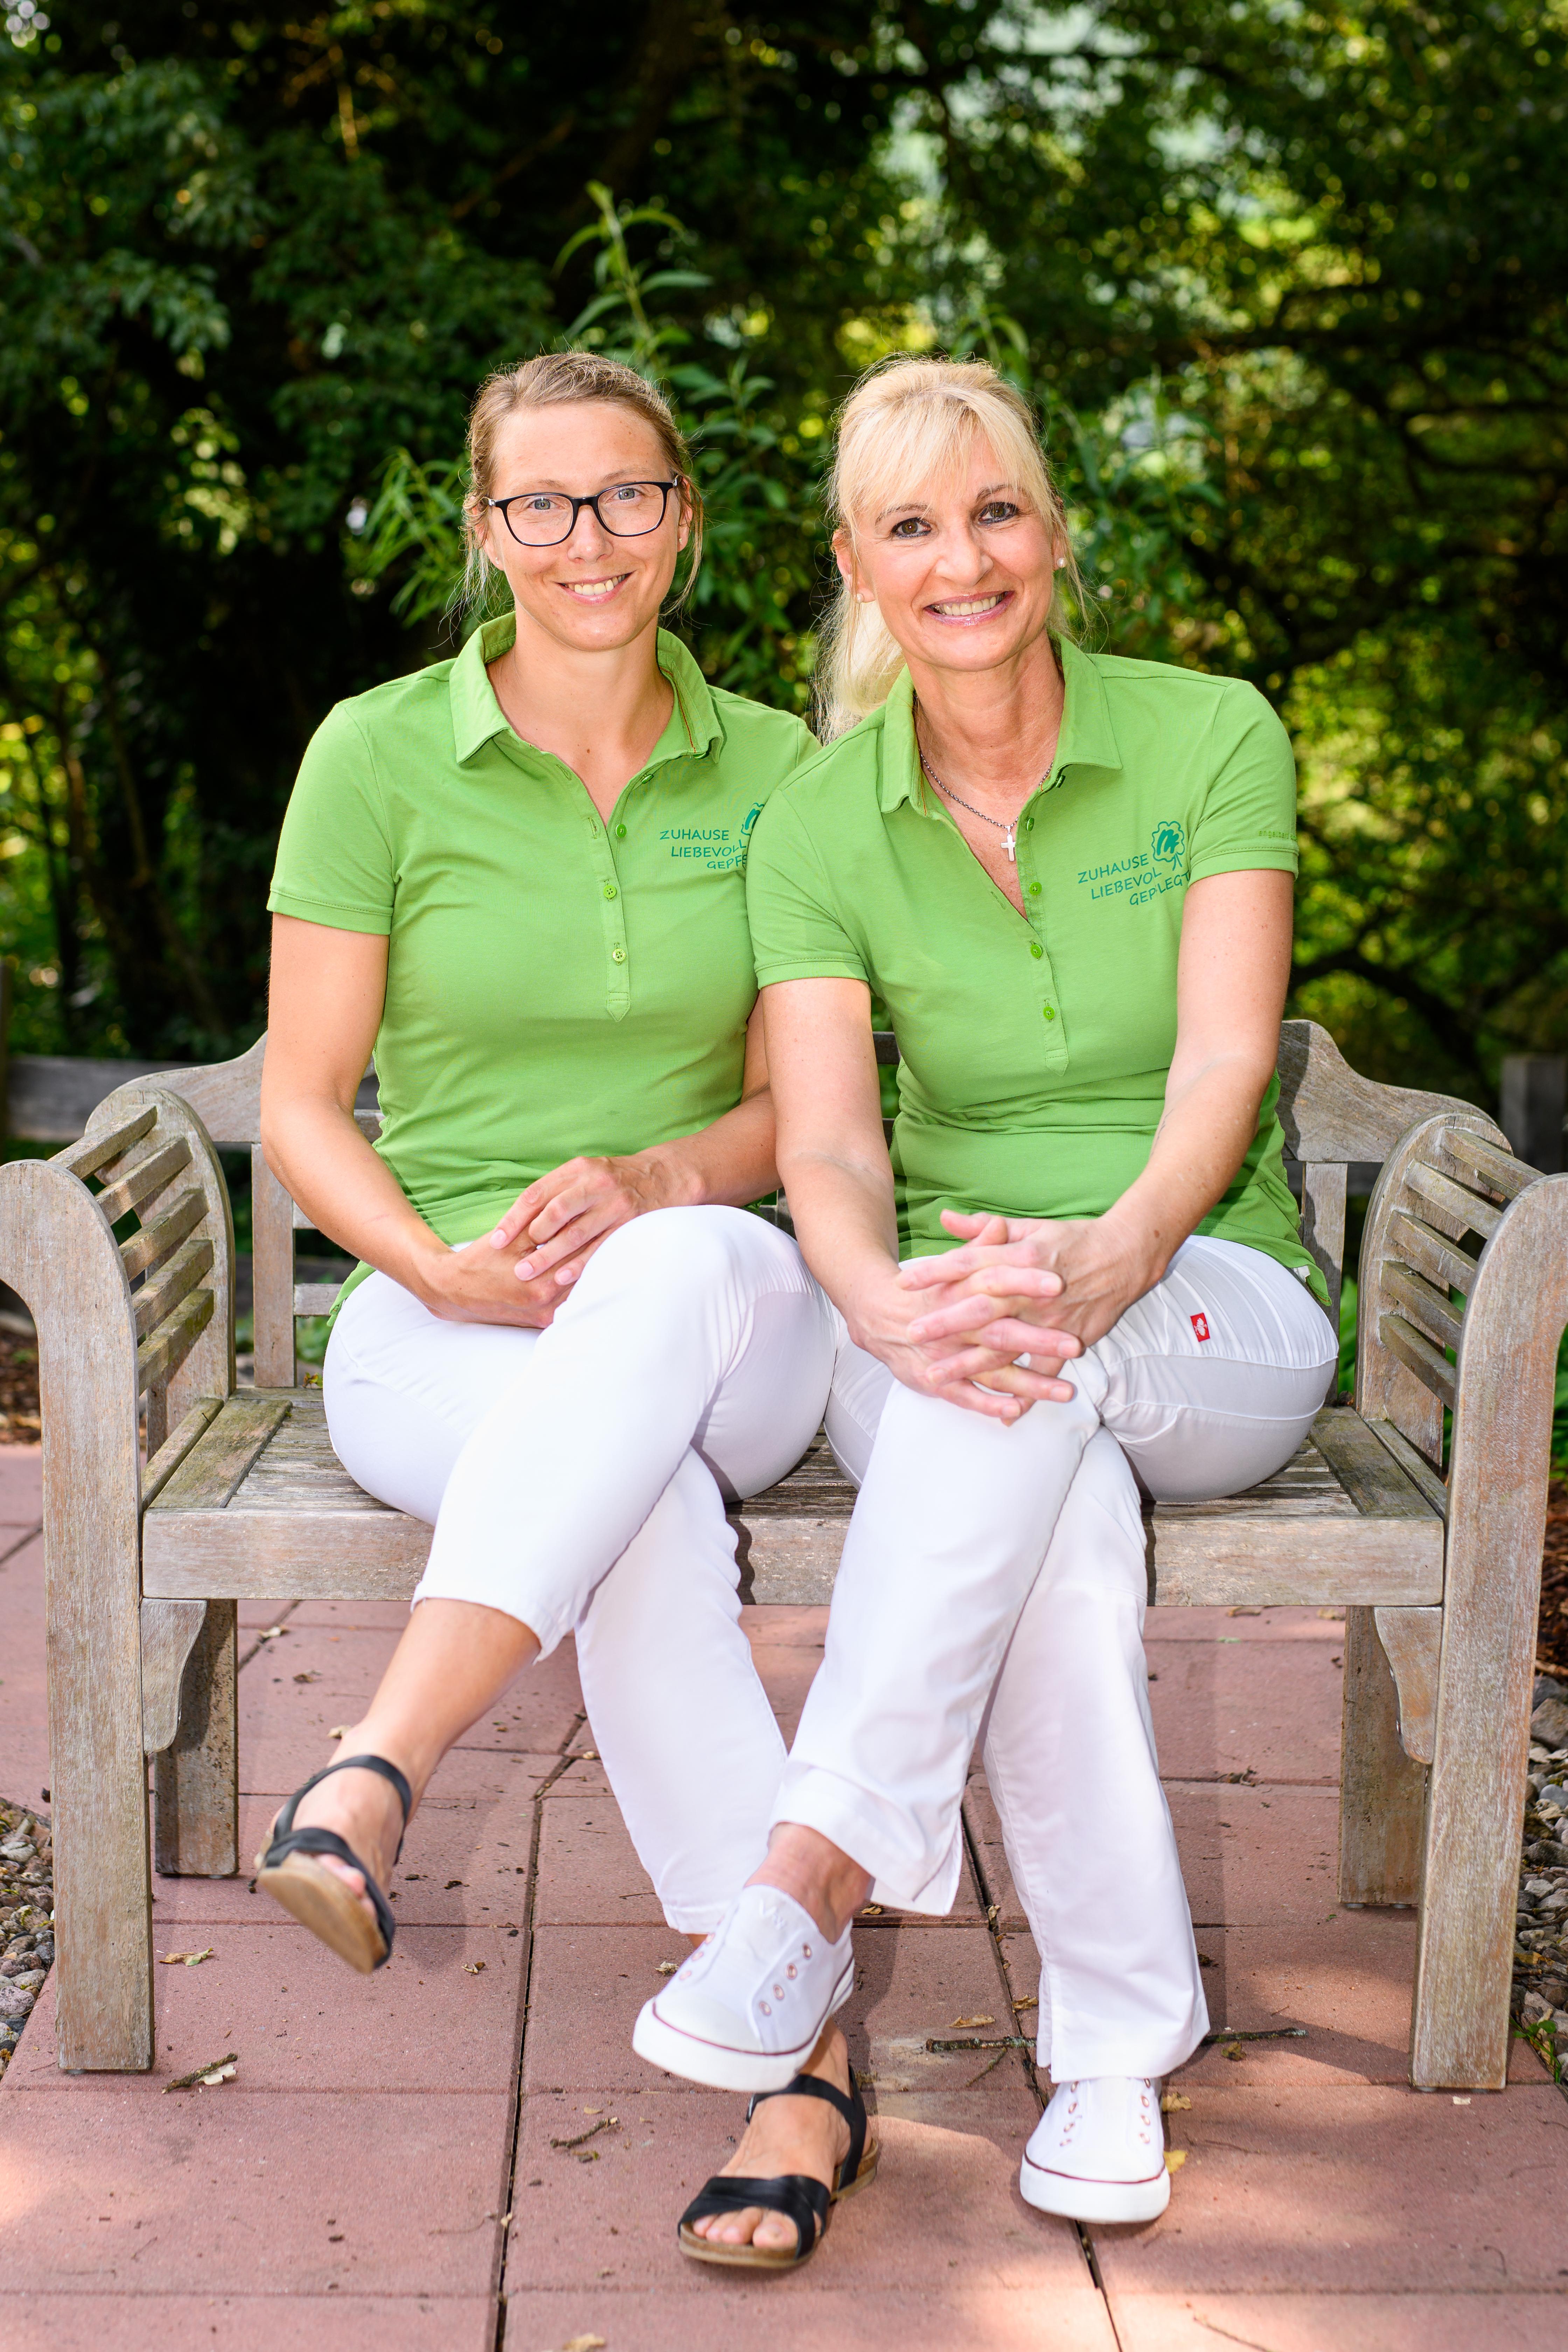 Marliese Polixenidis und Stephanie Sehn